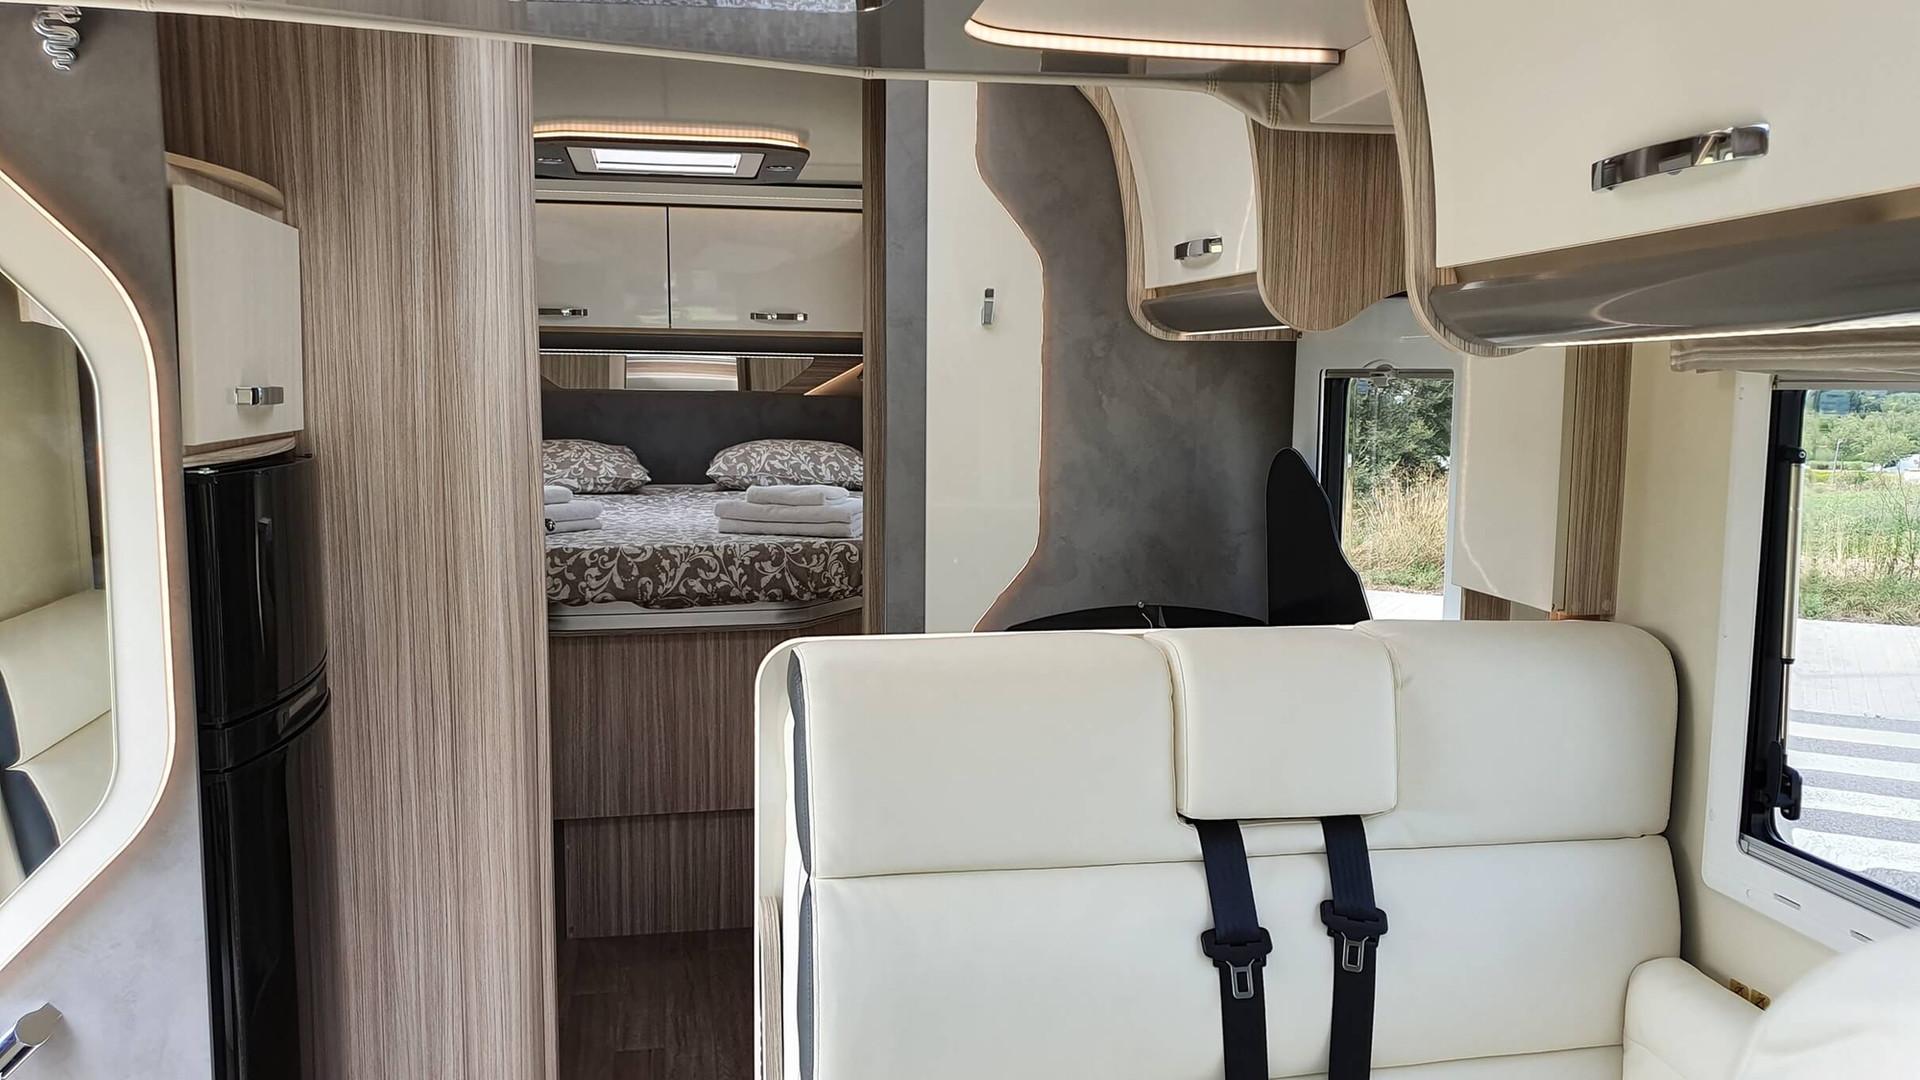 autocaravana super confortable